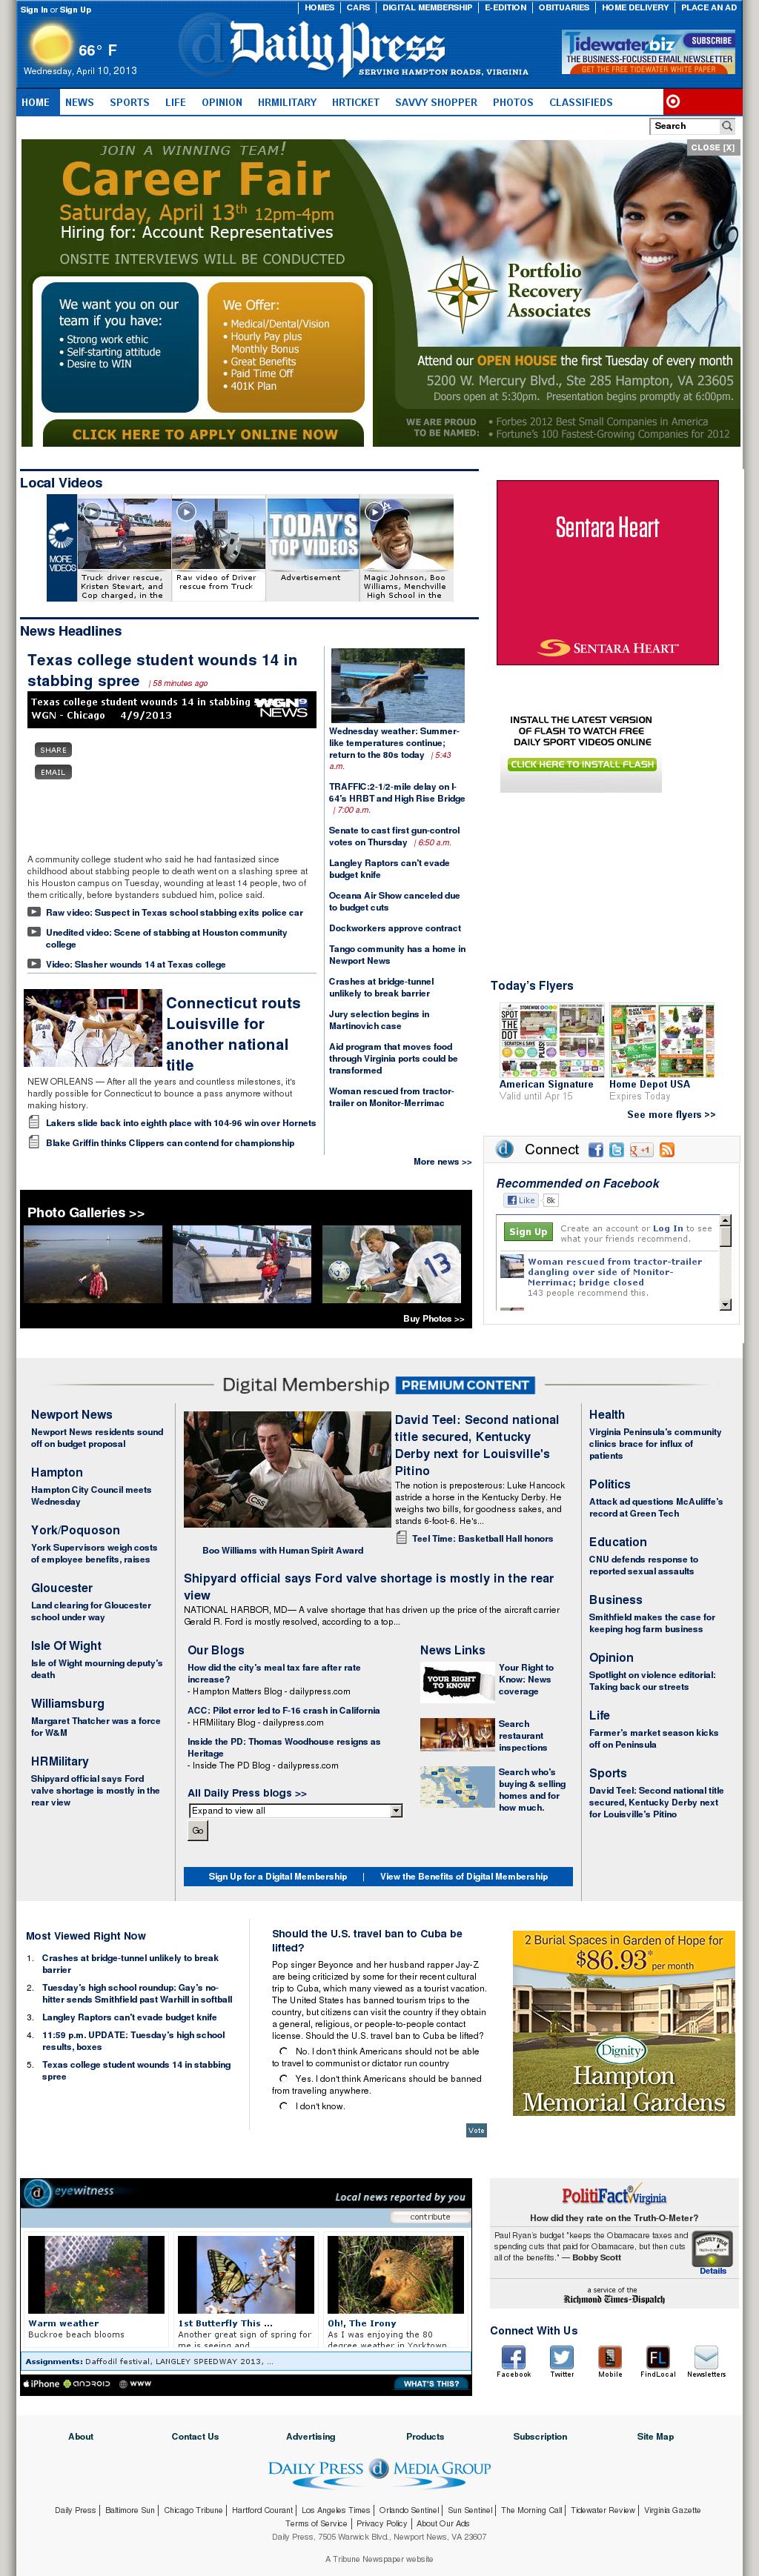 (Hampton Roads) Daily Press at Wednesday April 10, 2013, 12:04 p.m. UTC